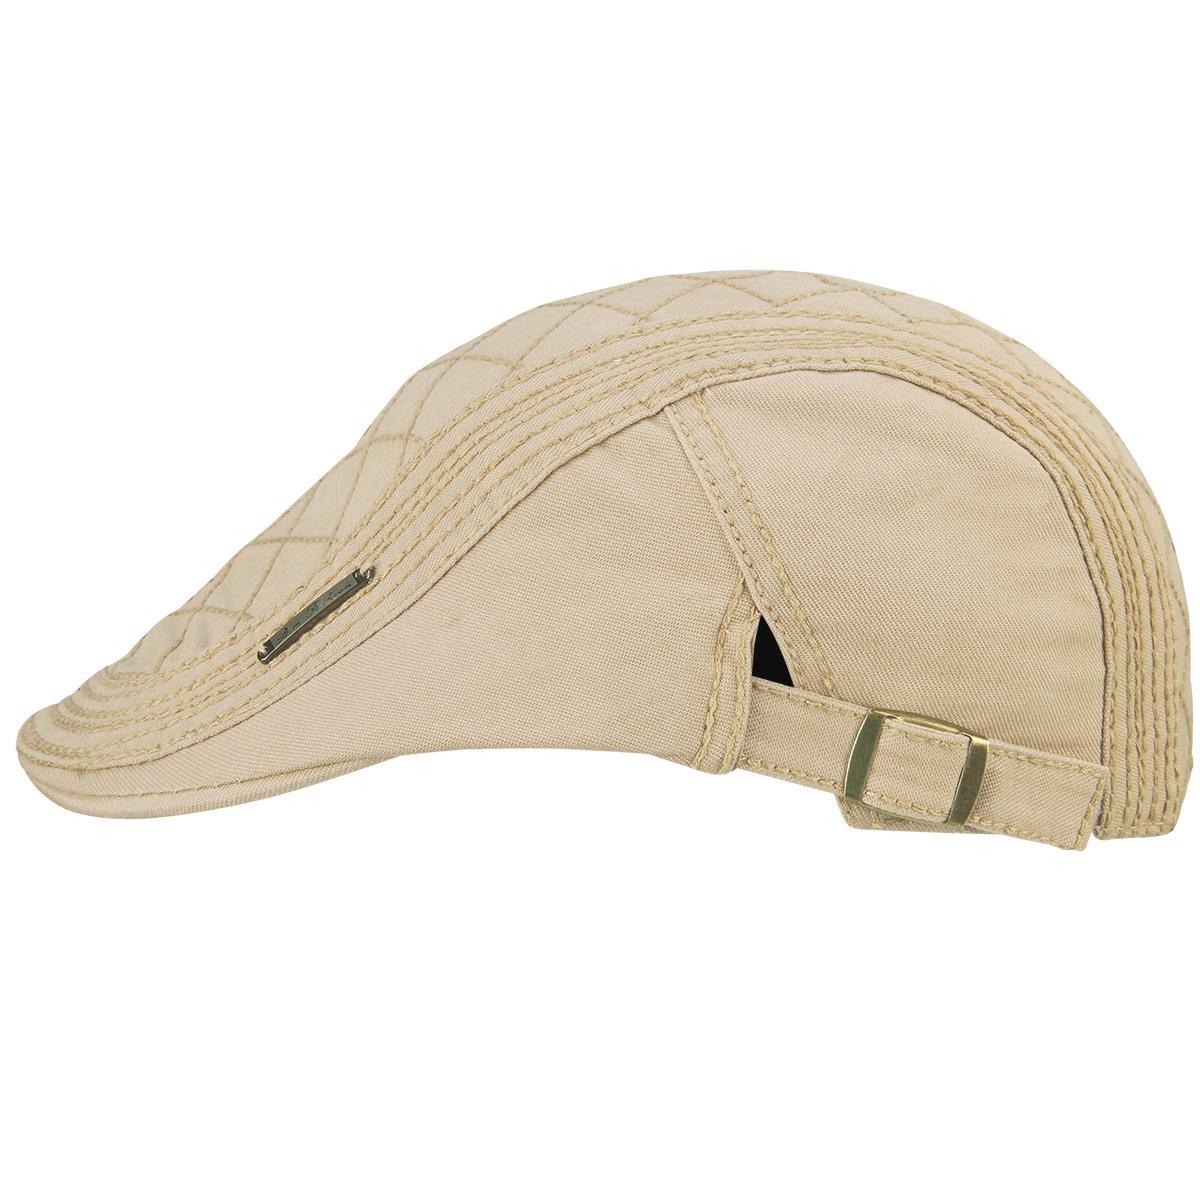 d46b82dab20 OMECHY Men s Cotton Flat Newsboy Cap Cabbie Ivy Duckbill Irish Cap Gatsby  Driving Golf Beret Hat Khaki at Amazon Men s Clothing store